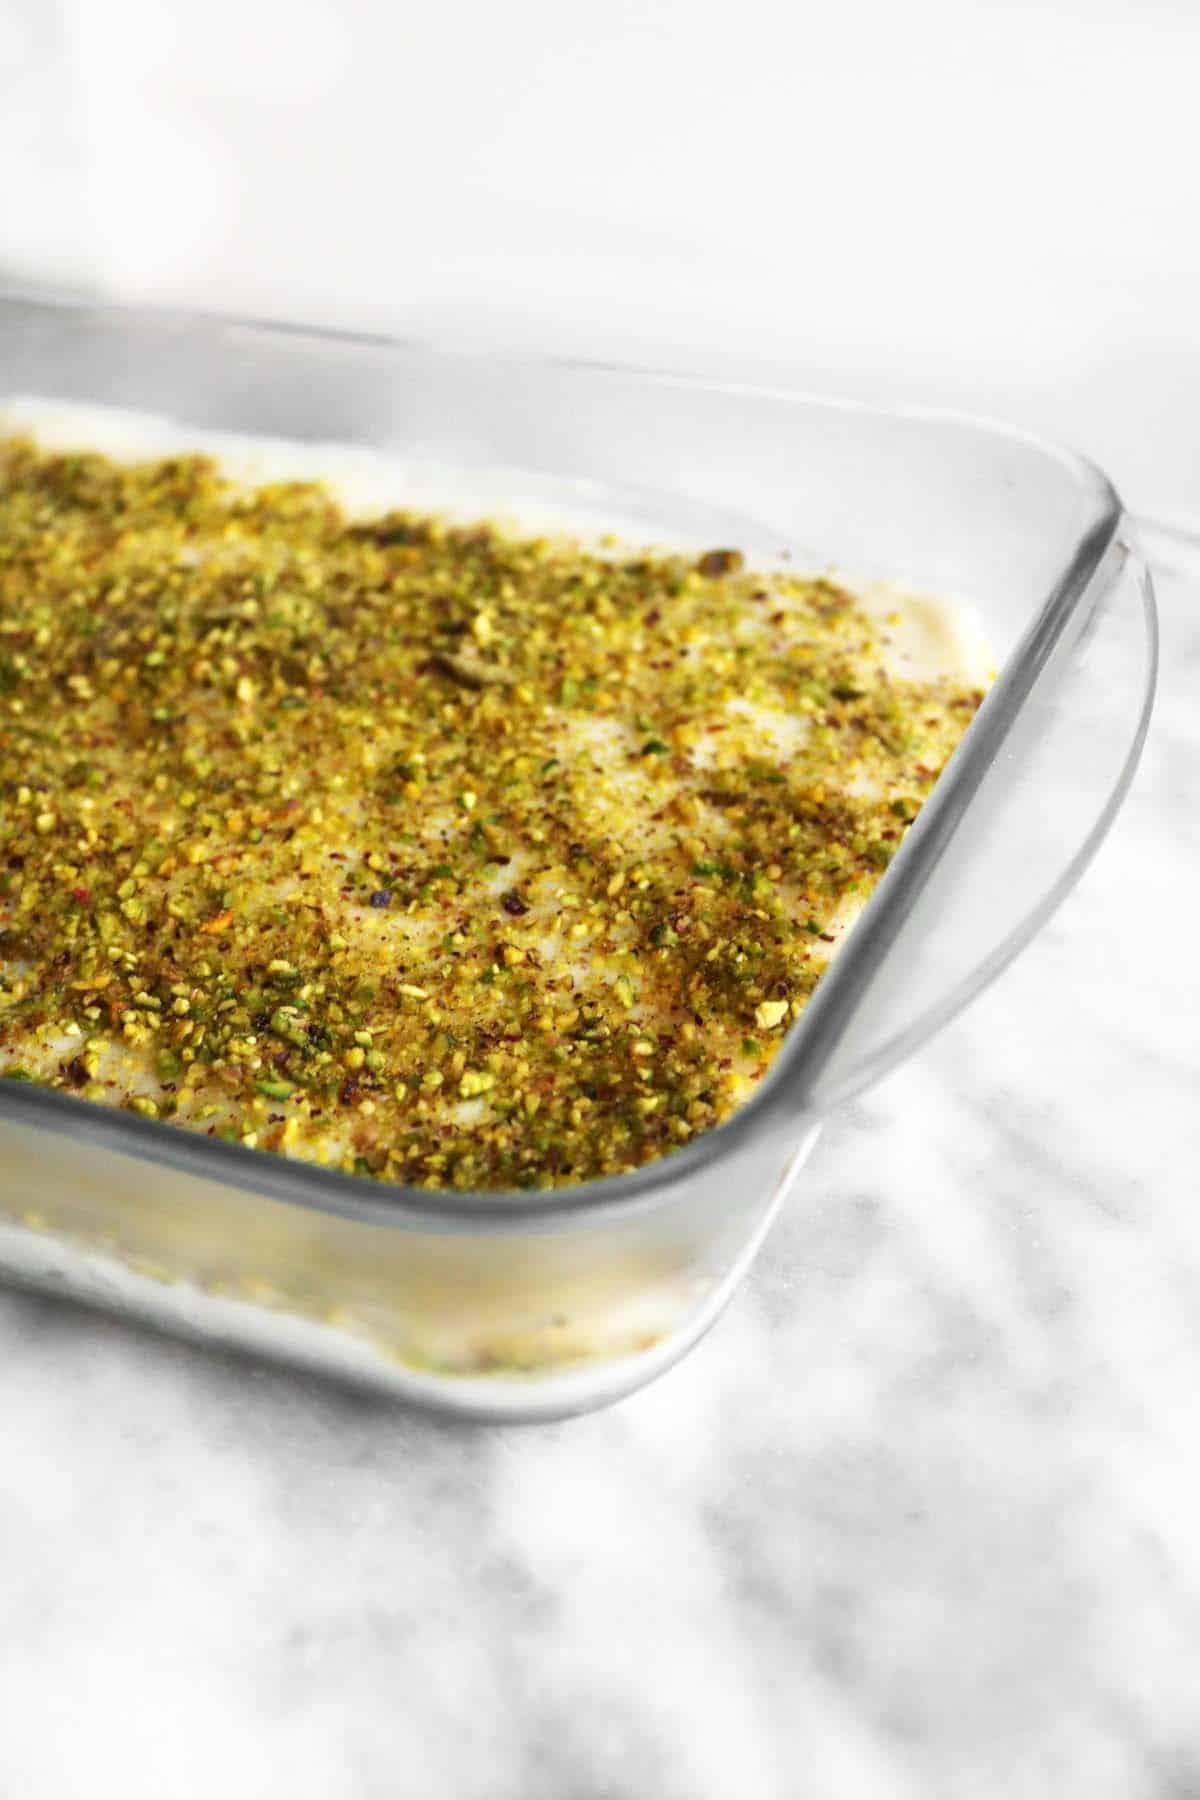 Aish el saraya in a pyrex glass dish